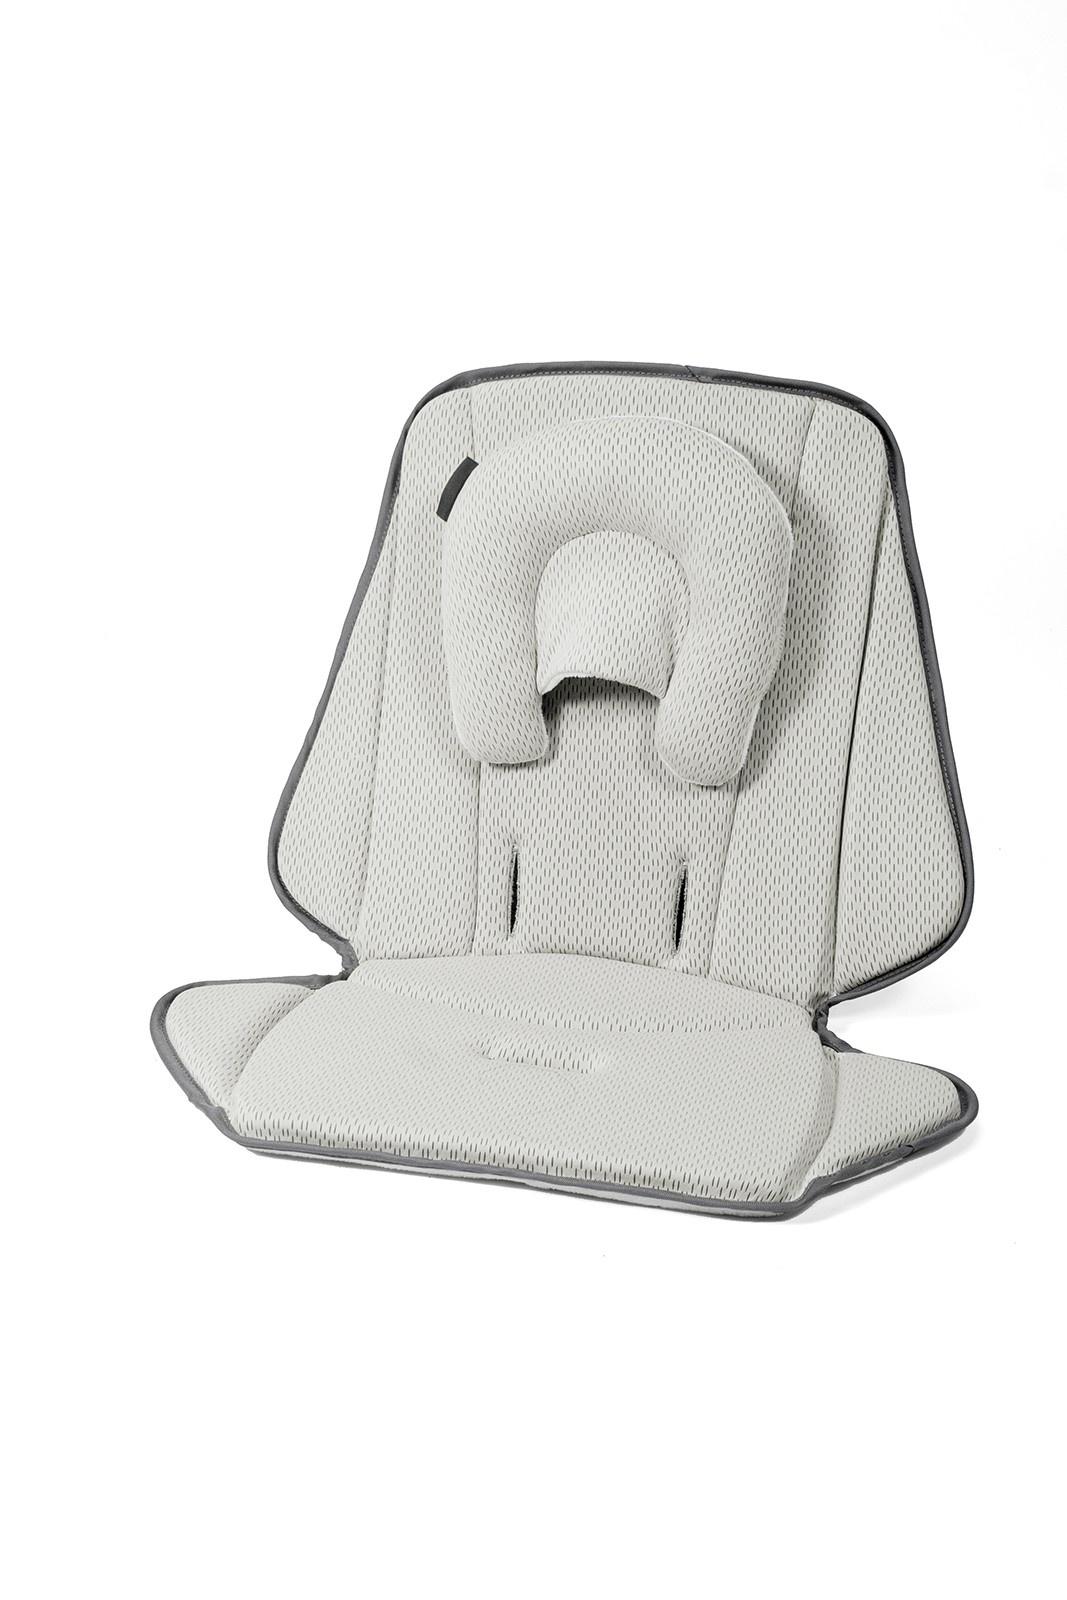 Аксессуар для колясок UPPAbaby Вкладыш для новорожденного аксессуар для колясок uppababy 0918 lma ww